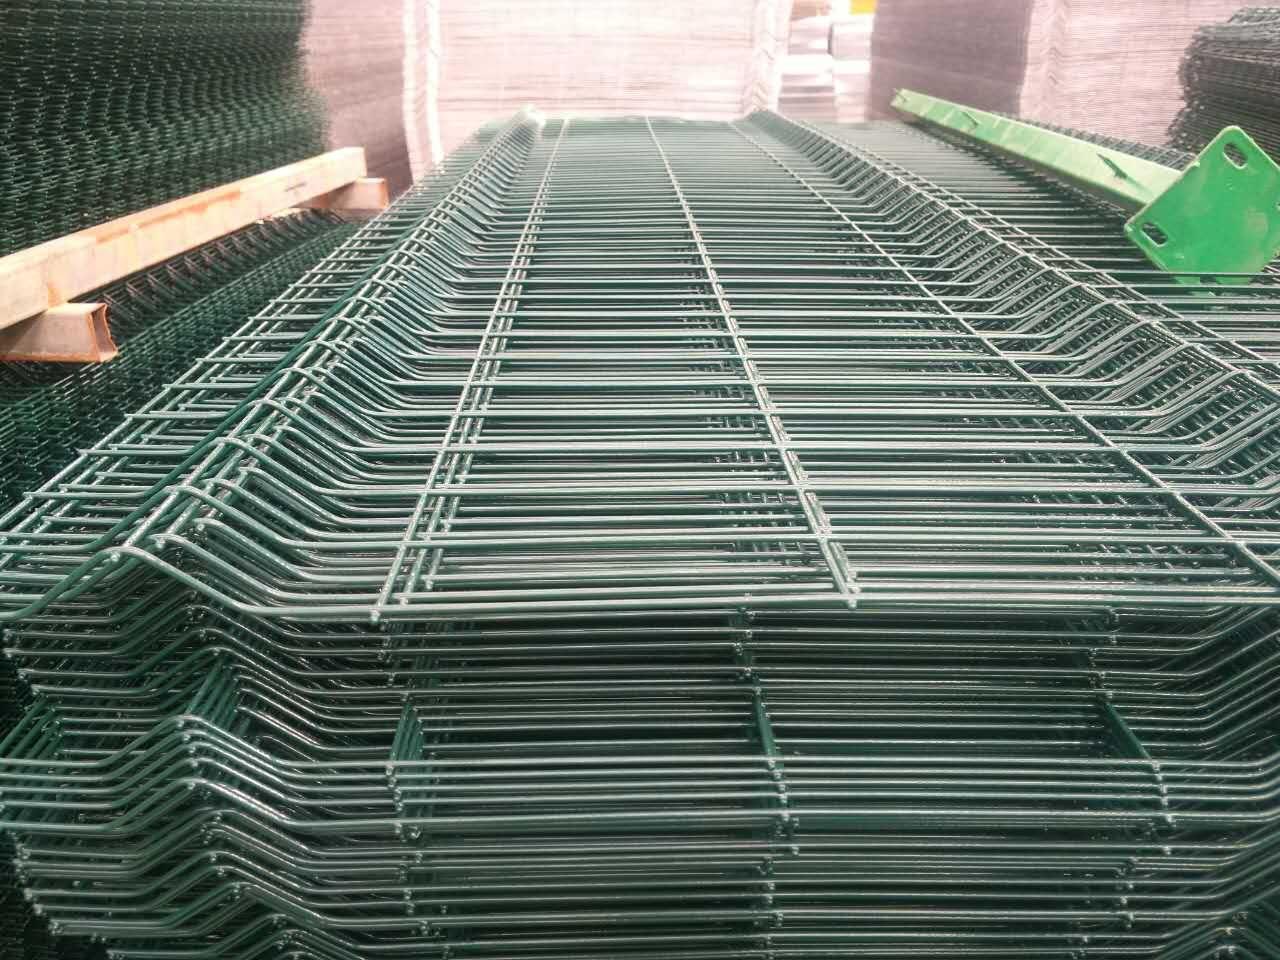 dark green bending wire mesh fence wire diameter:4mm Pitch:60*200mm ...